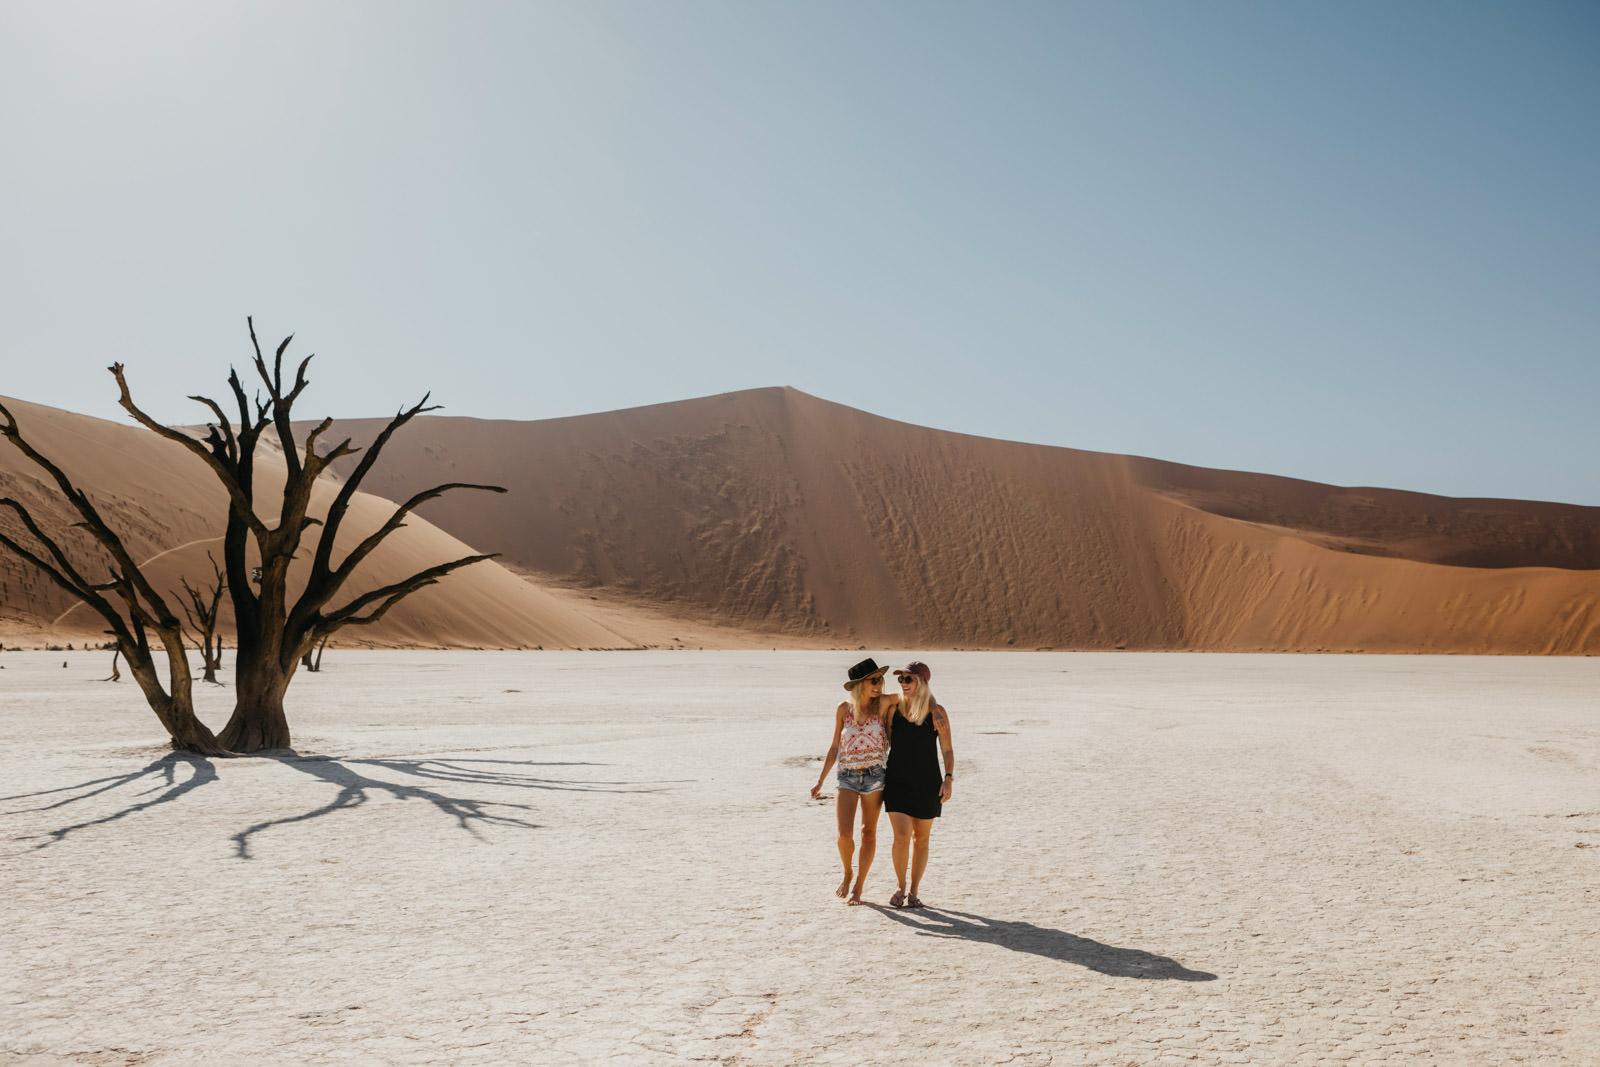 namibia_trip_rooftent_camping_roadtrip (19 von 26).jpg